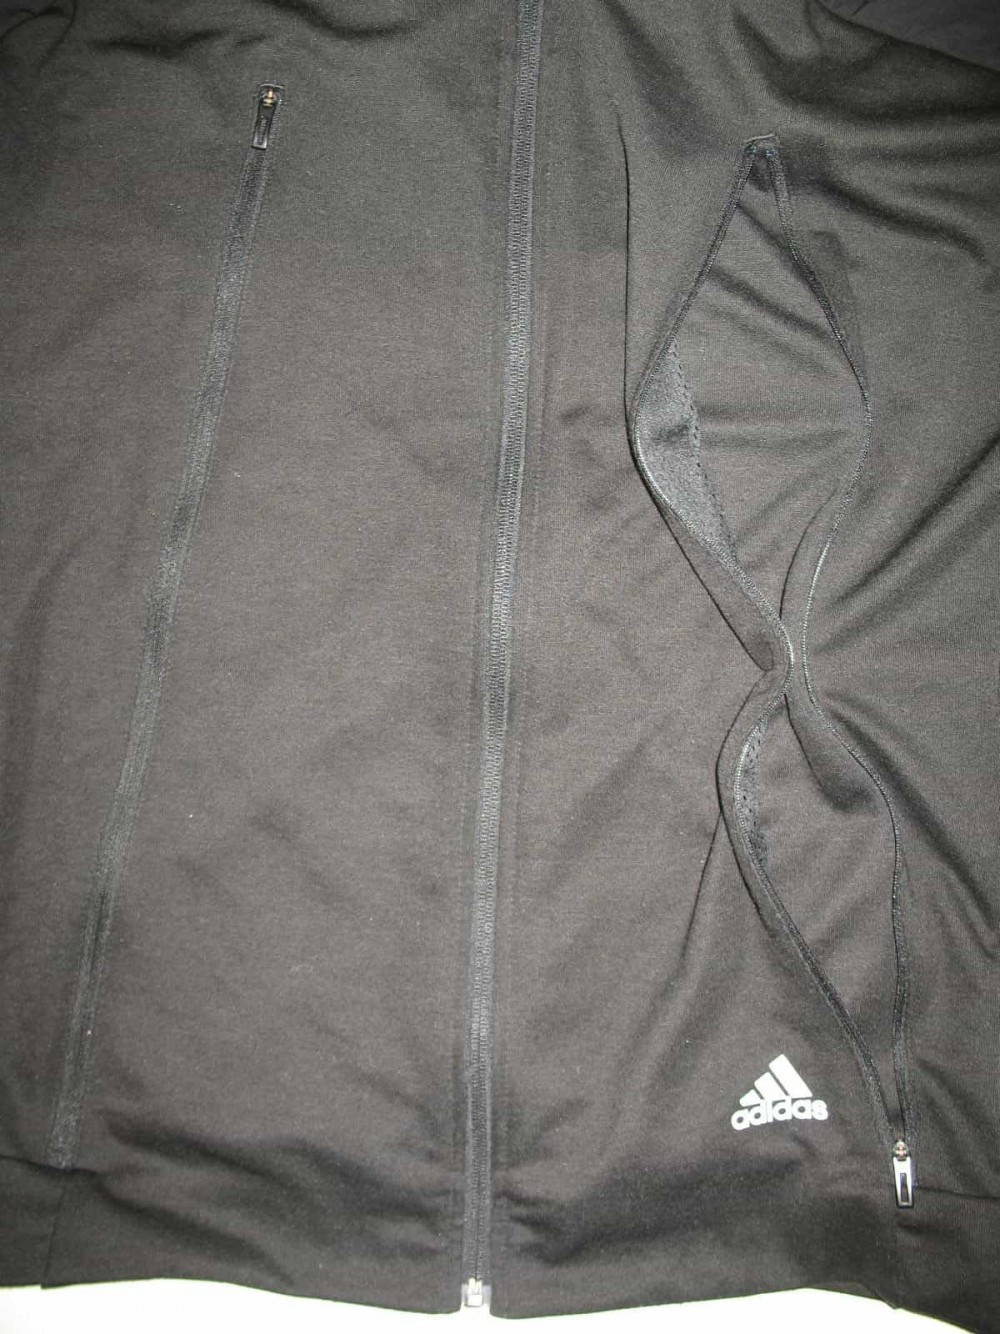 Куртка ADIDAS id hybrid jacket (размер M) - 7